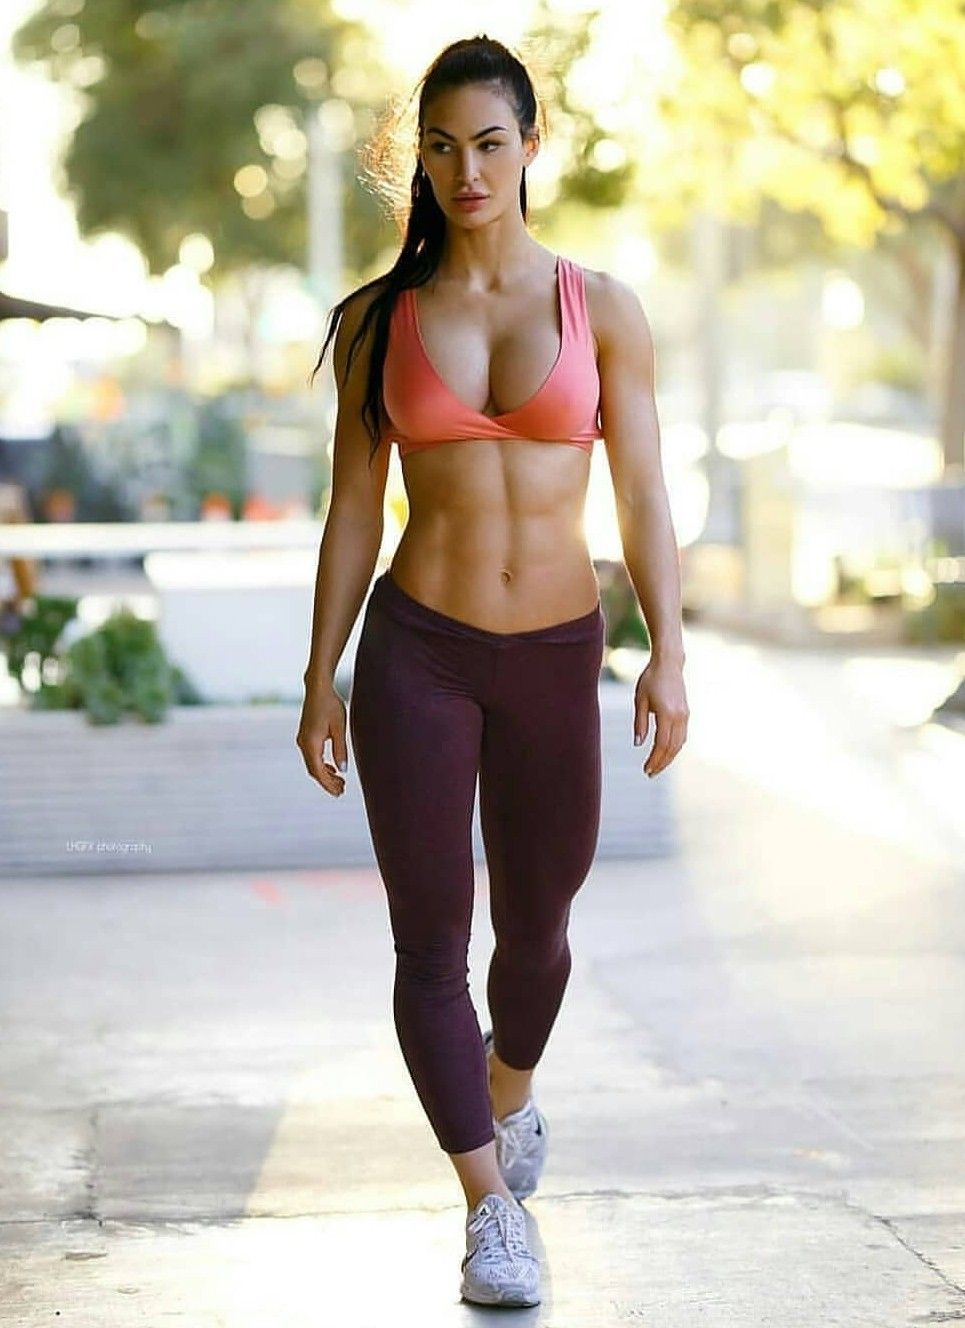 Fitness models Sexy Body 40c0b4511699